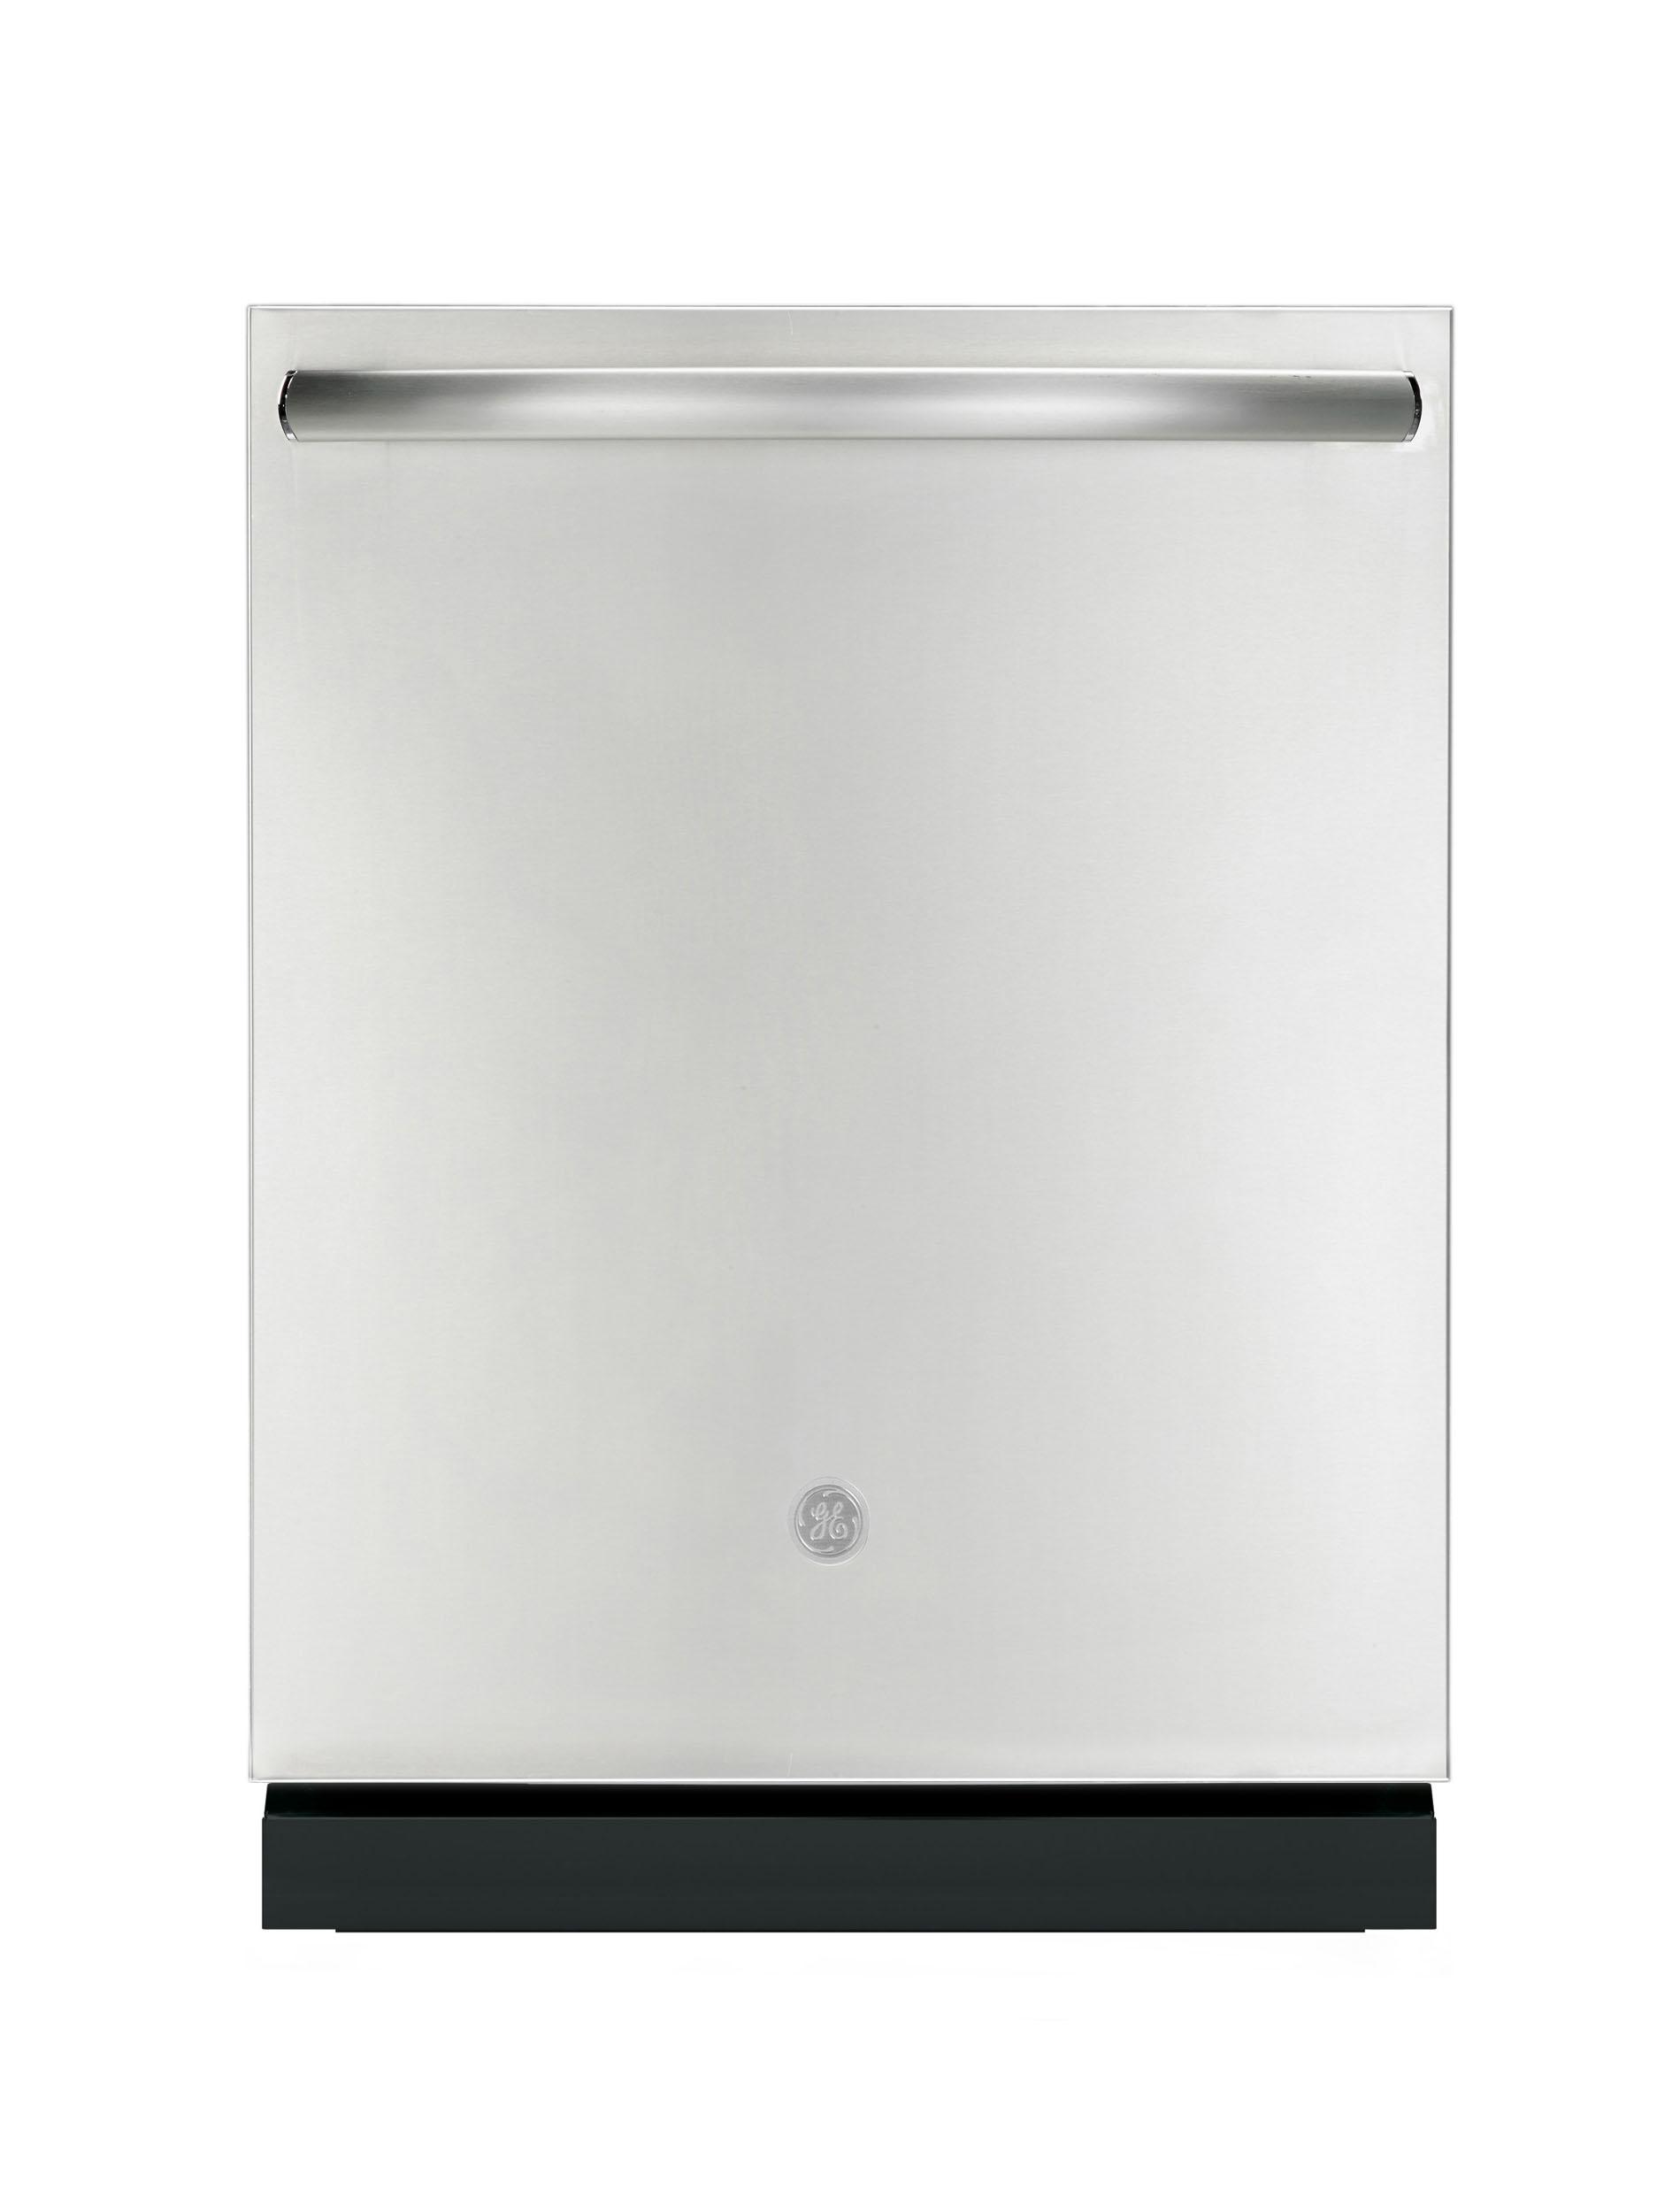 22628 – Stainless Steel Dishwasher w/ Tall Tub – GBT632SSMSS